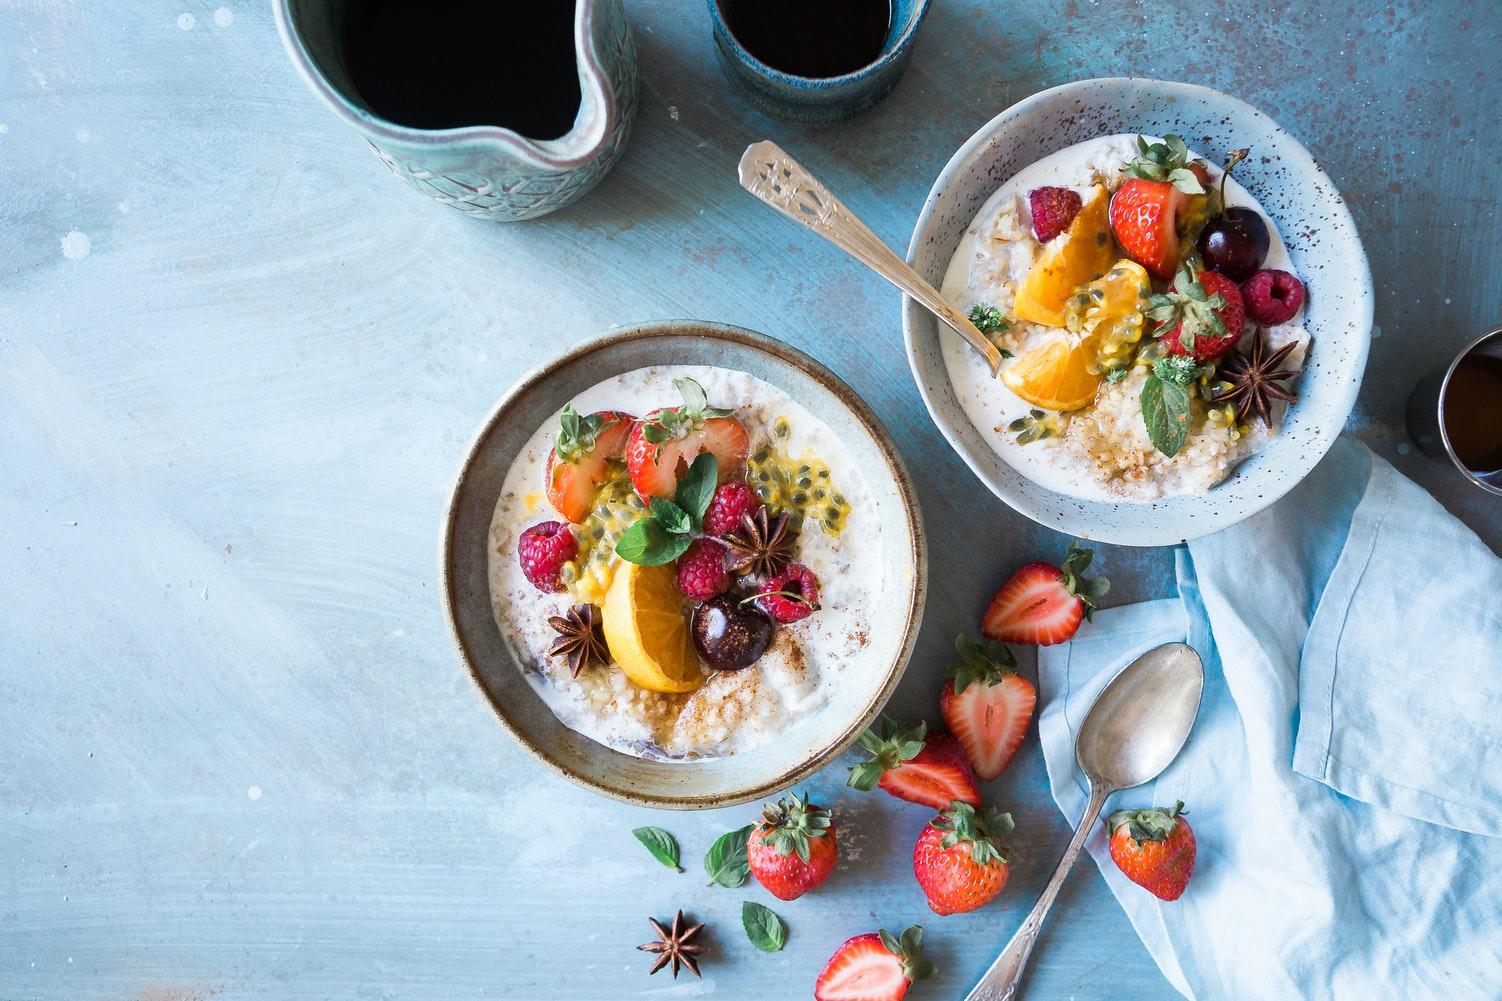 Yogurtlu Brokoli Salatasi - 95 Kalori